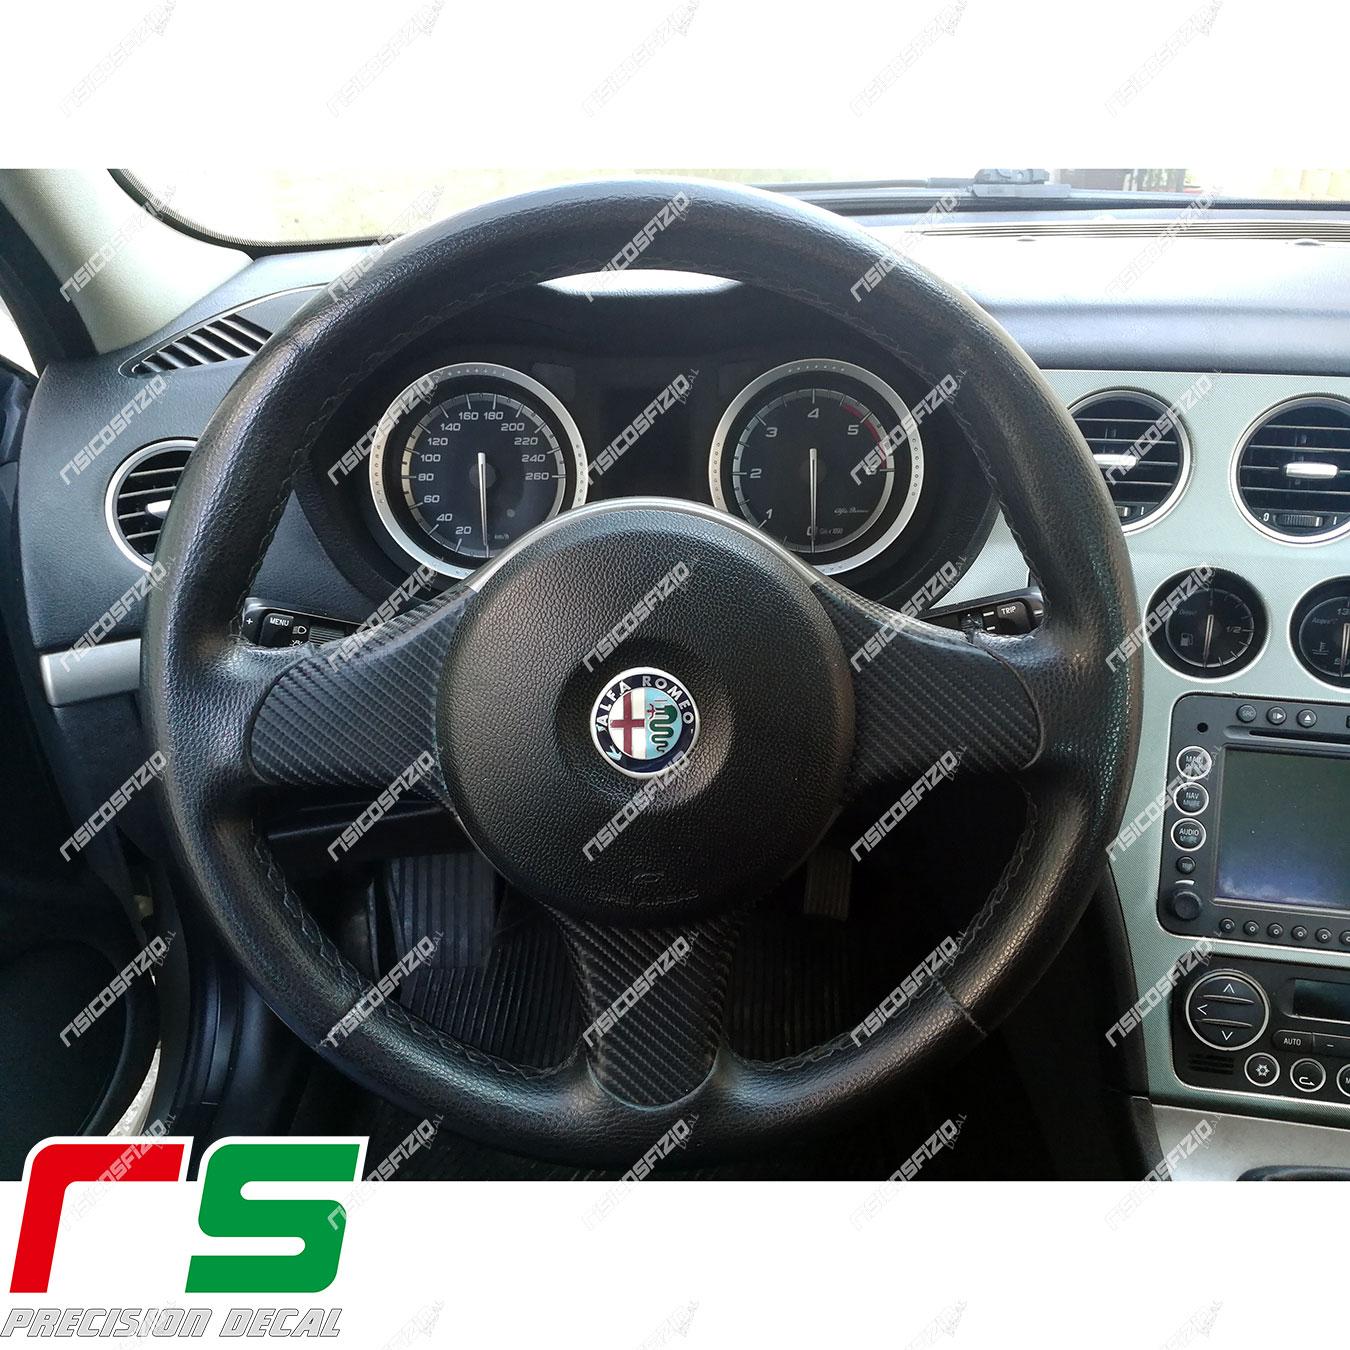 adesivi Alfa Romeo 159 carbon look decal cover razze